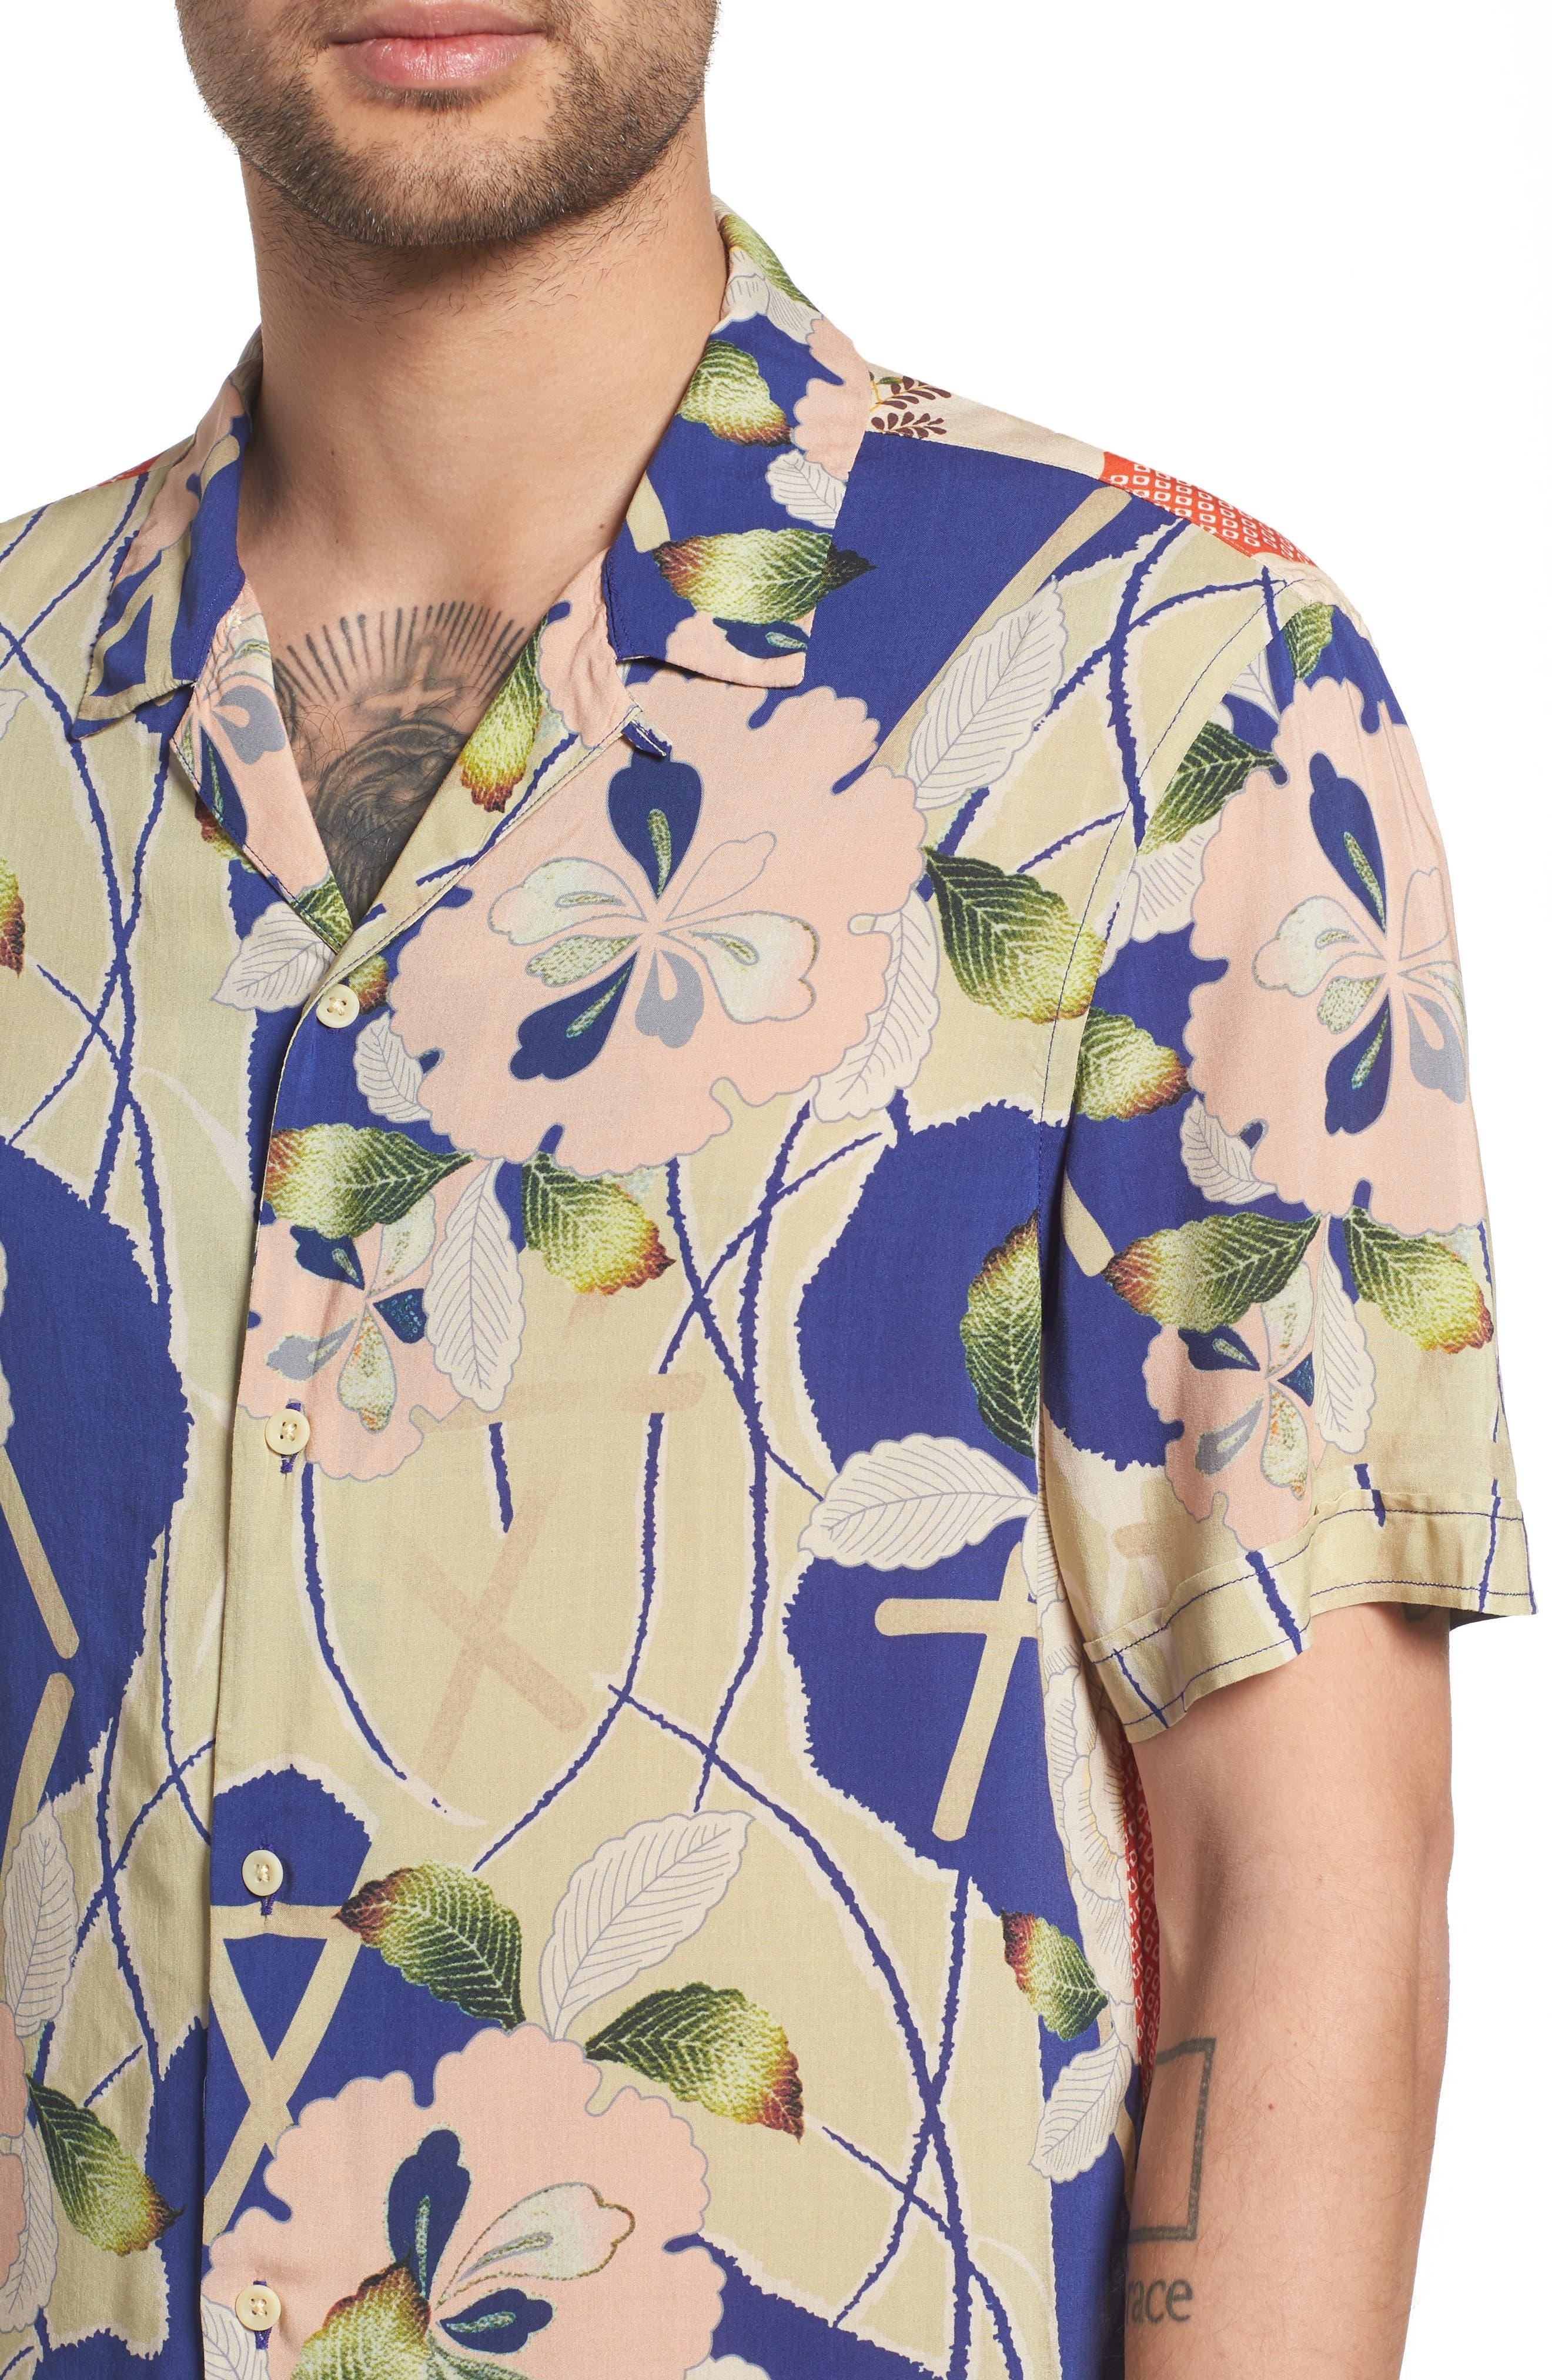 Fuyugi Regular Fit Short Sleeve Sport Shirt,                             Alternate thumbnail 4, color,                             412